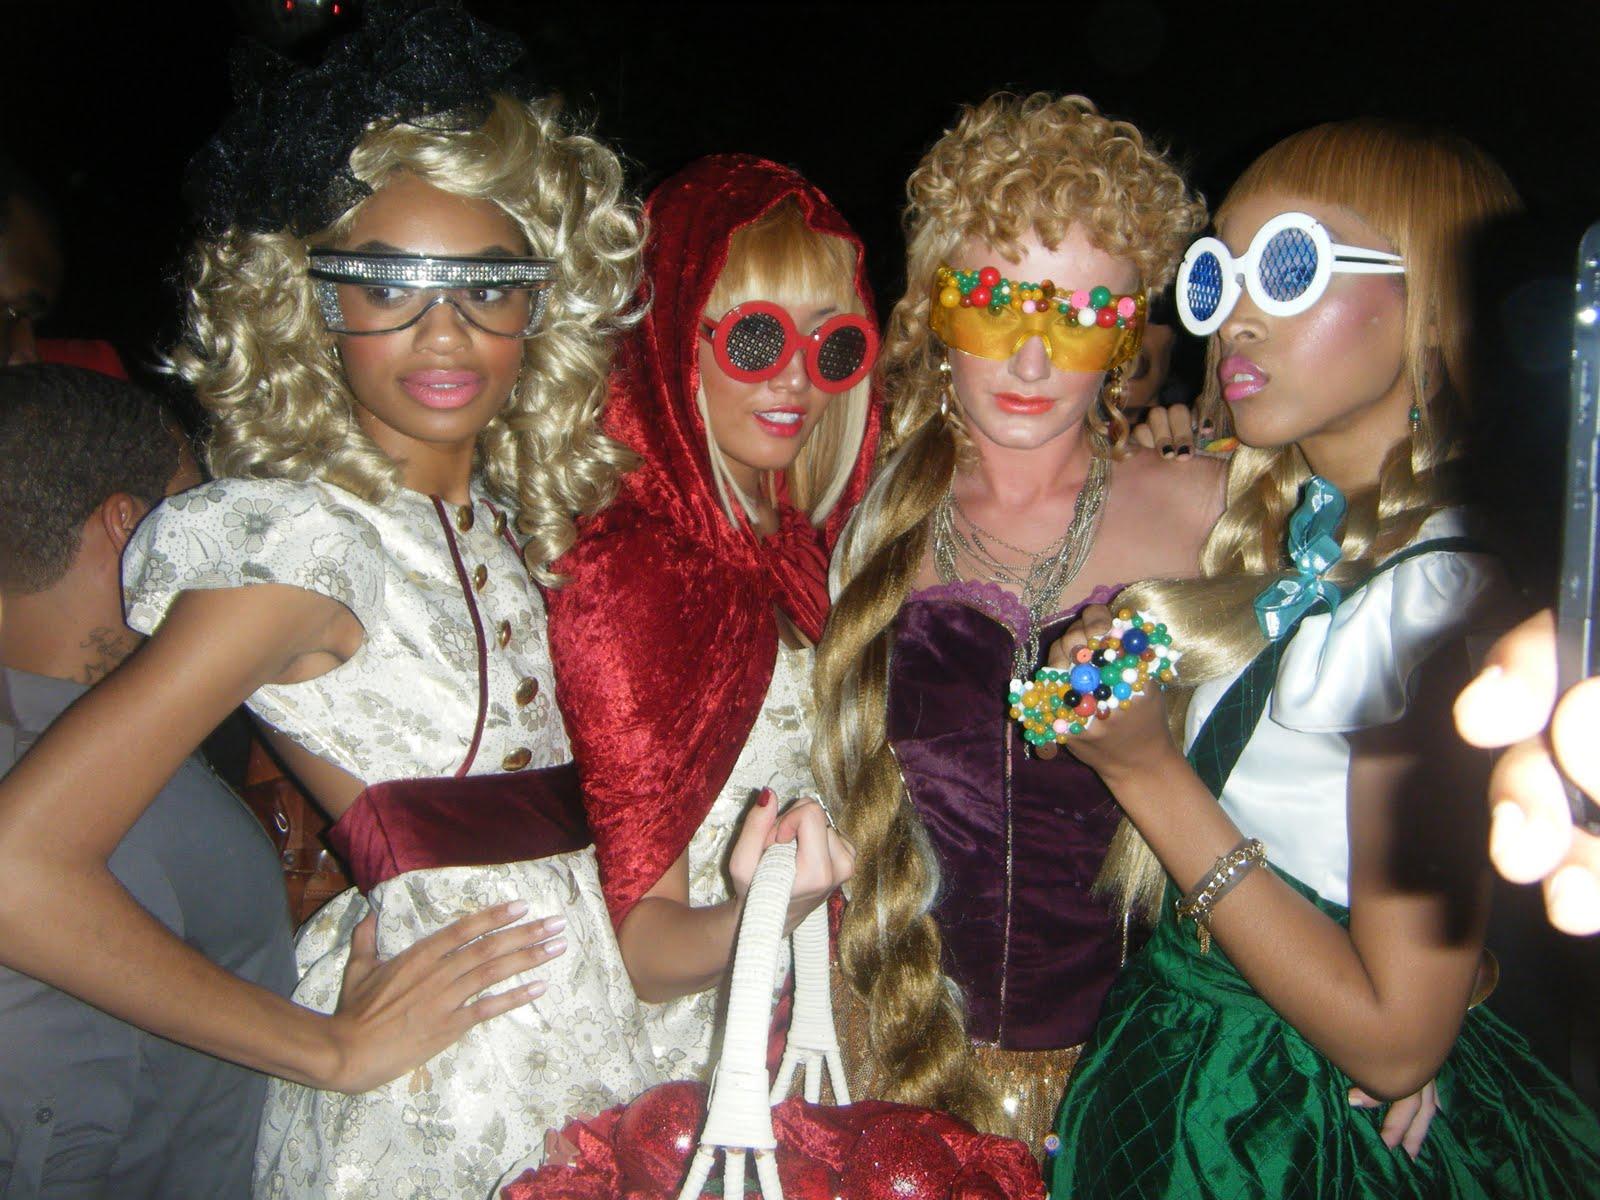 http://1.bp.blogspot.com/_TofkA3LCFog/TI74iK6cm2I/AAAAAAAAAIs/Q2sGS750lY4/s1600/fairy+tale.jpg